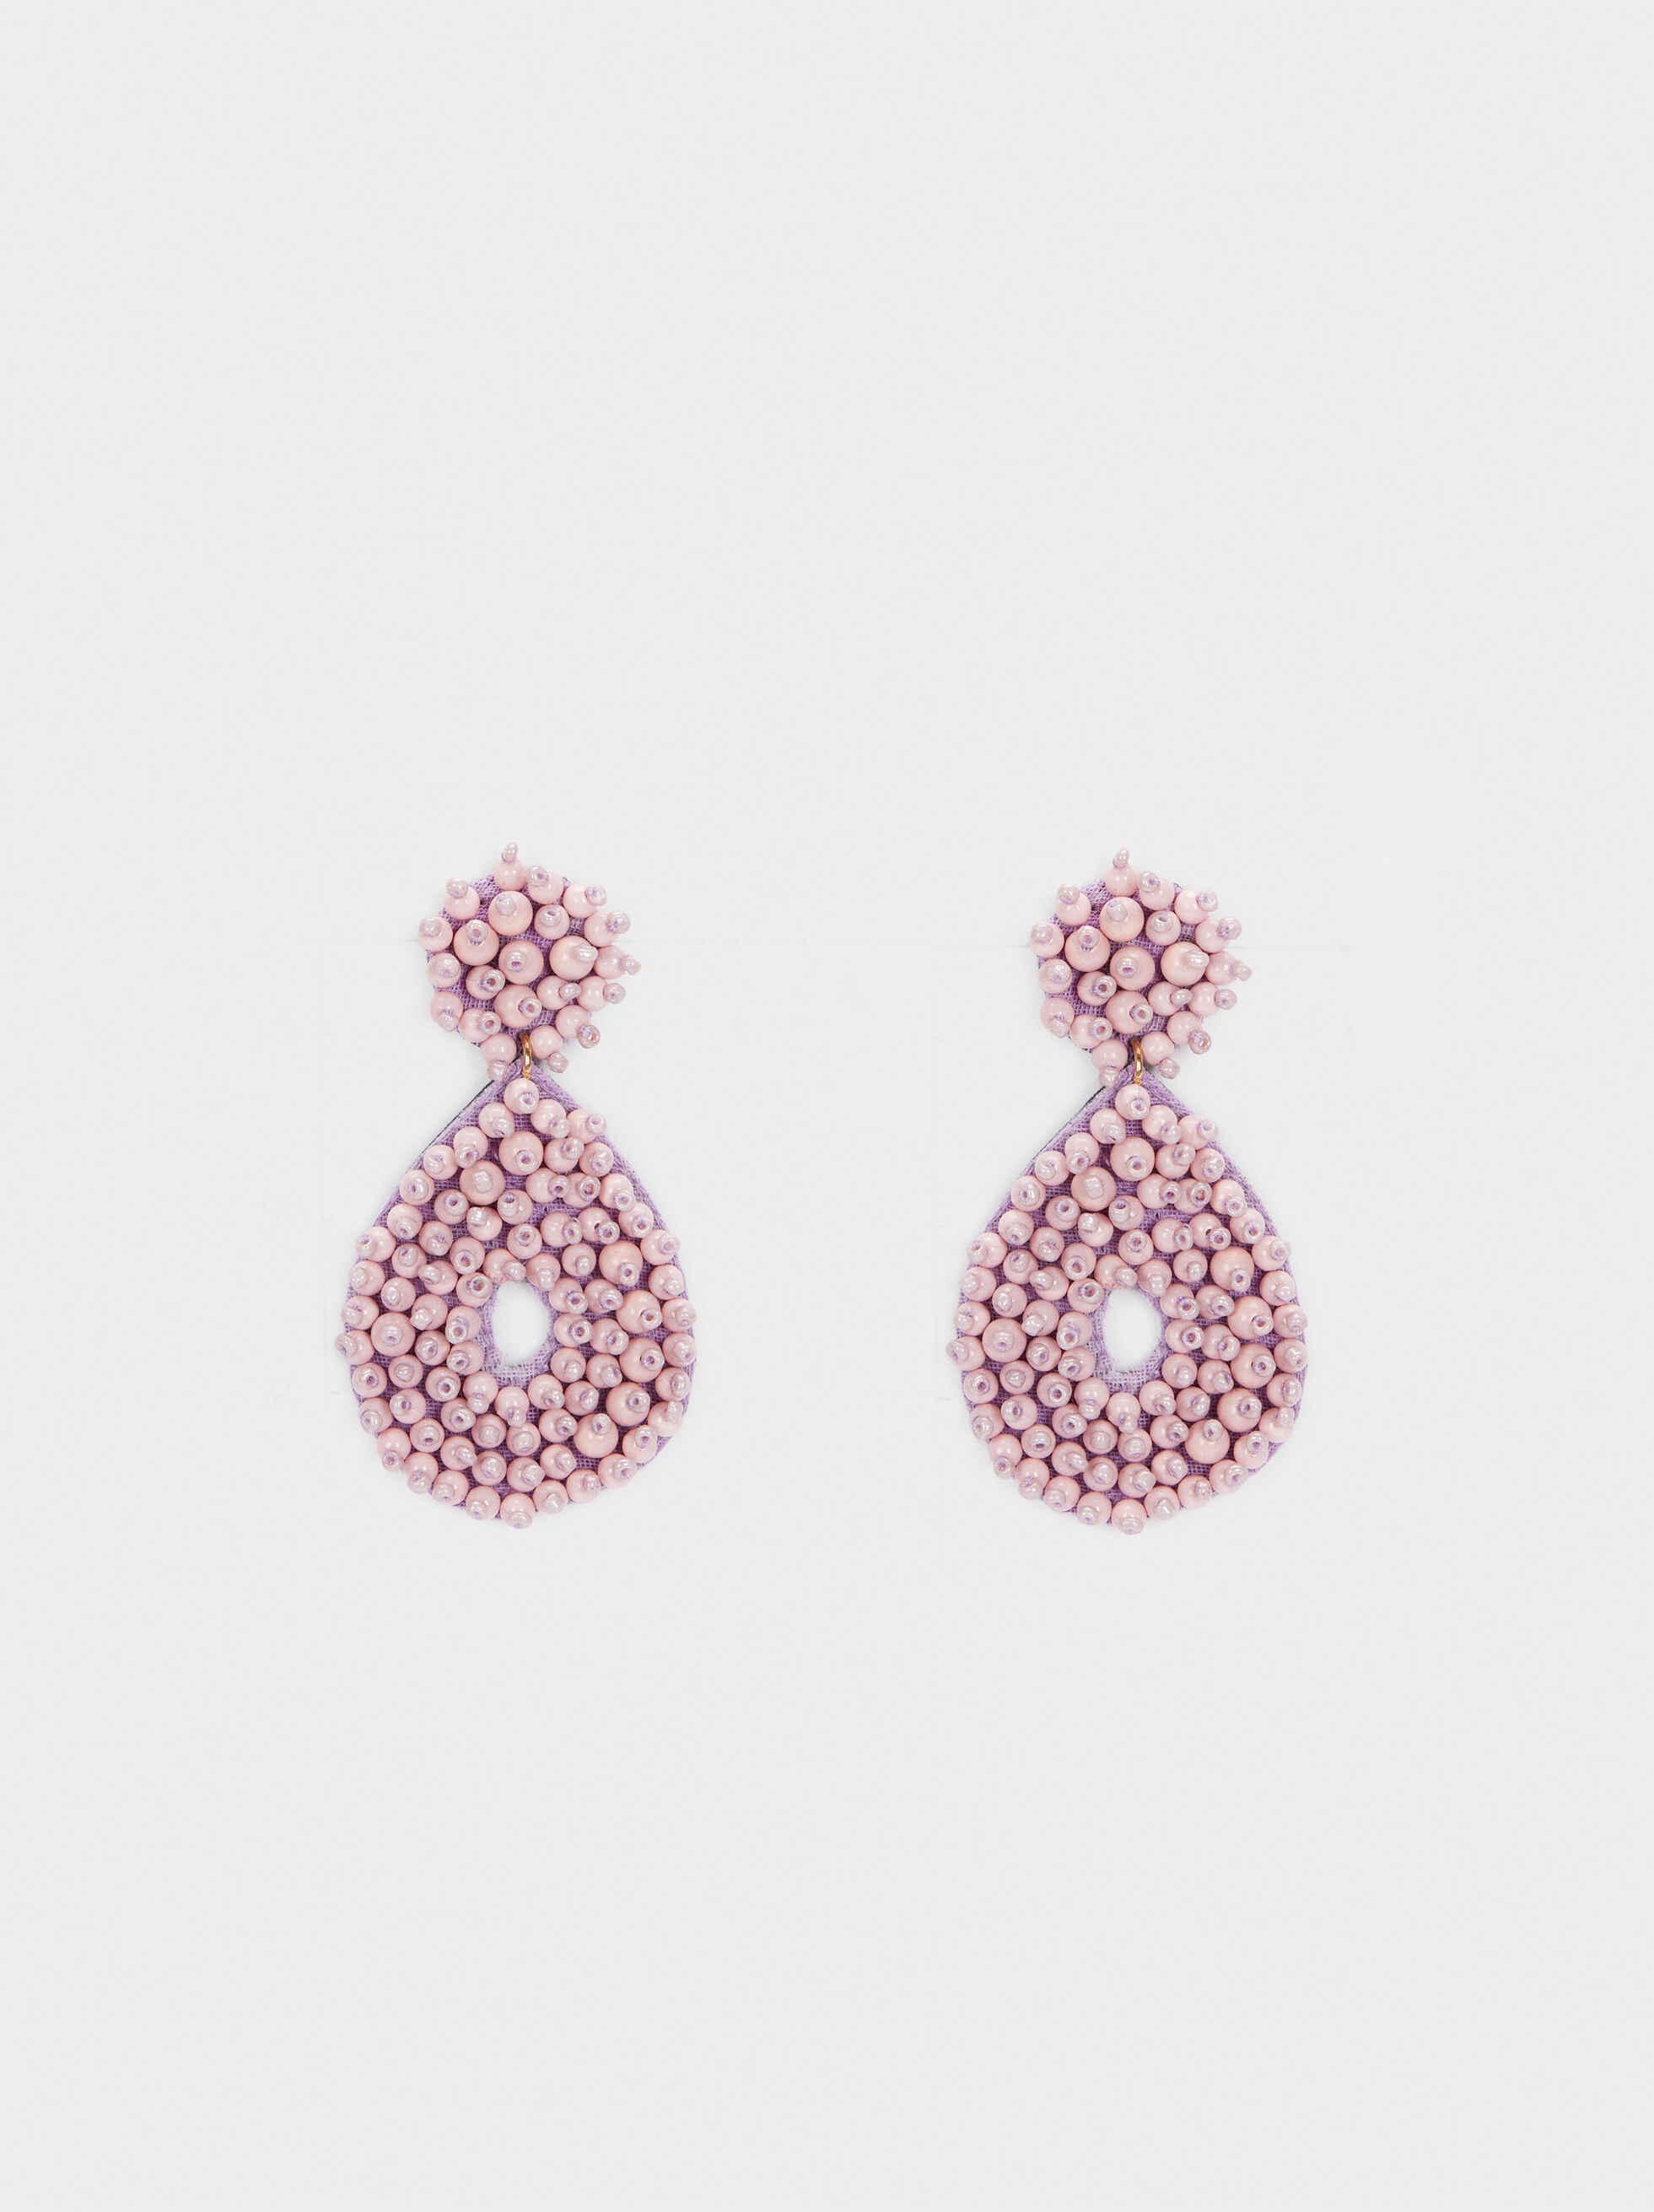 Watercolor Medium Earrings With Beads, Violet, hi-res